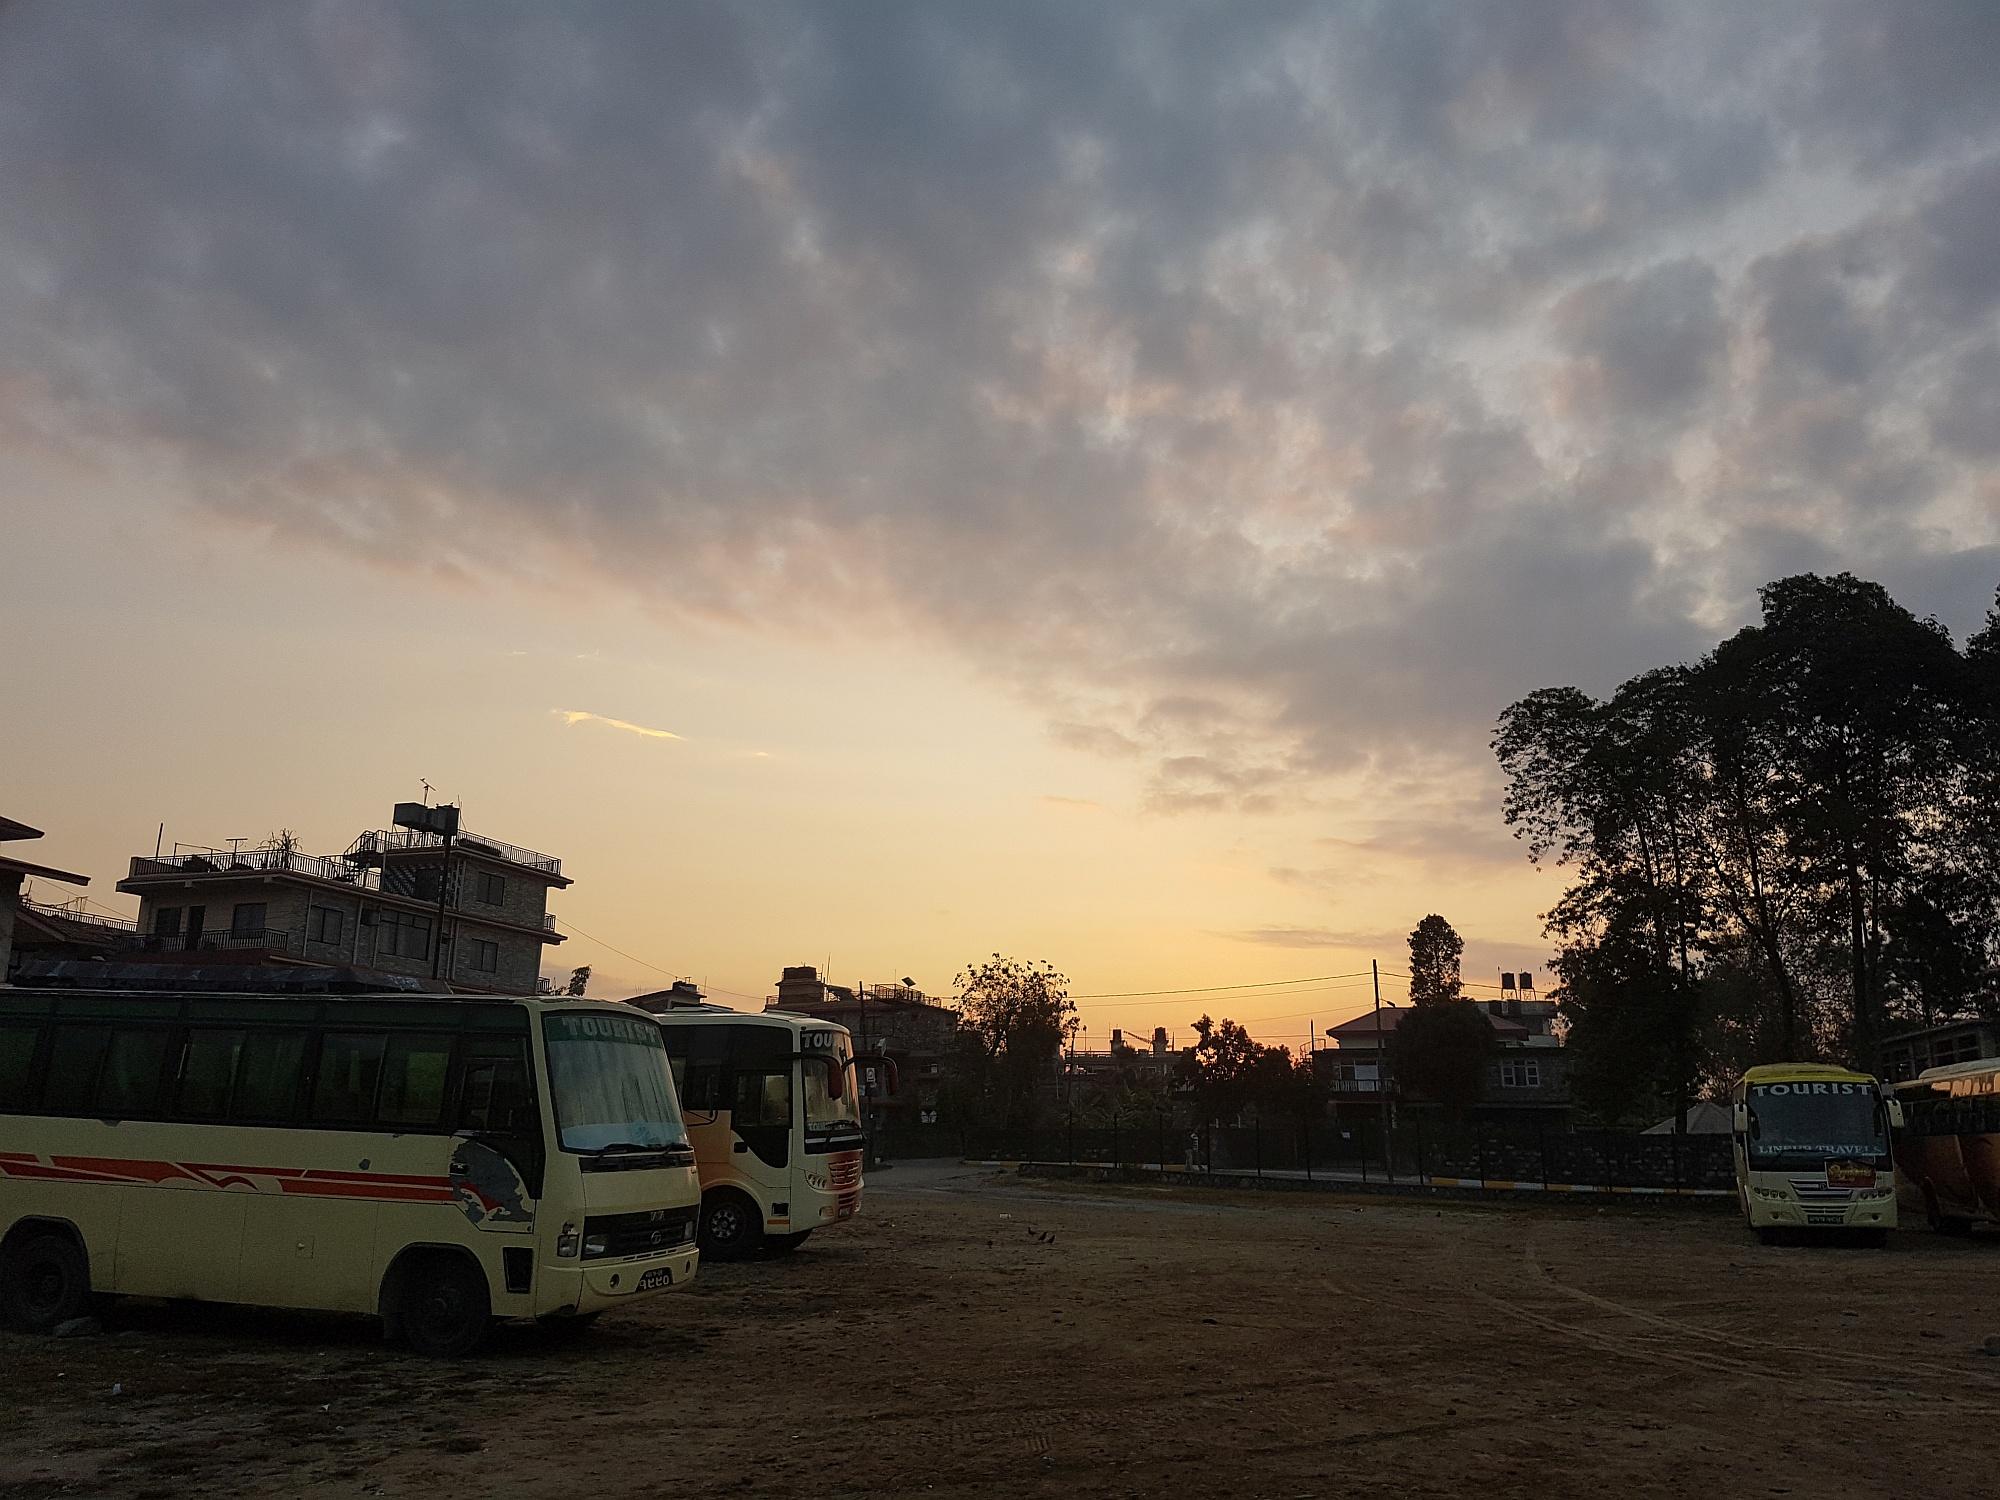 Sonnenaufgang am Busbahnhof von Pokhara